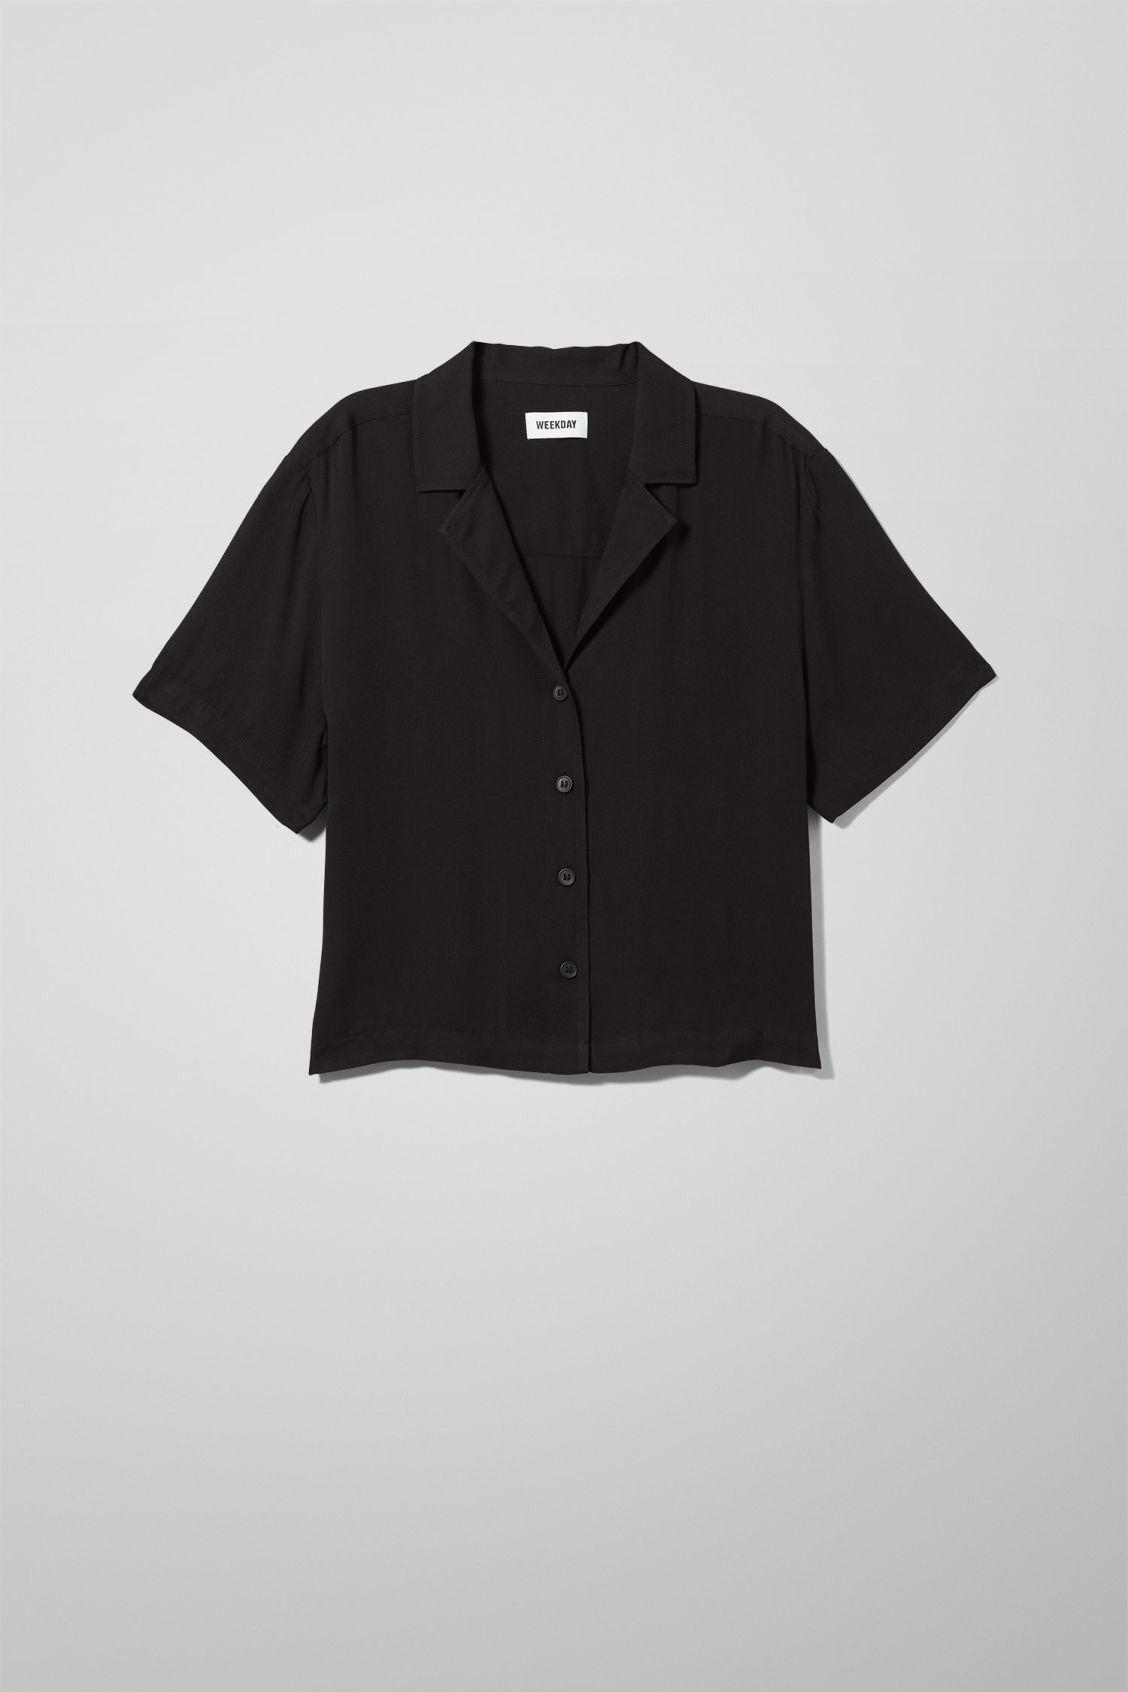 Image of Cyra Short Sleeve Shirt - Black-XS